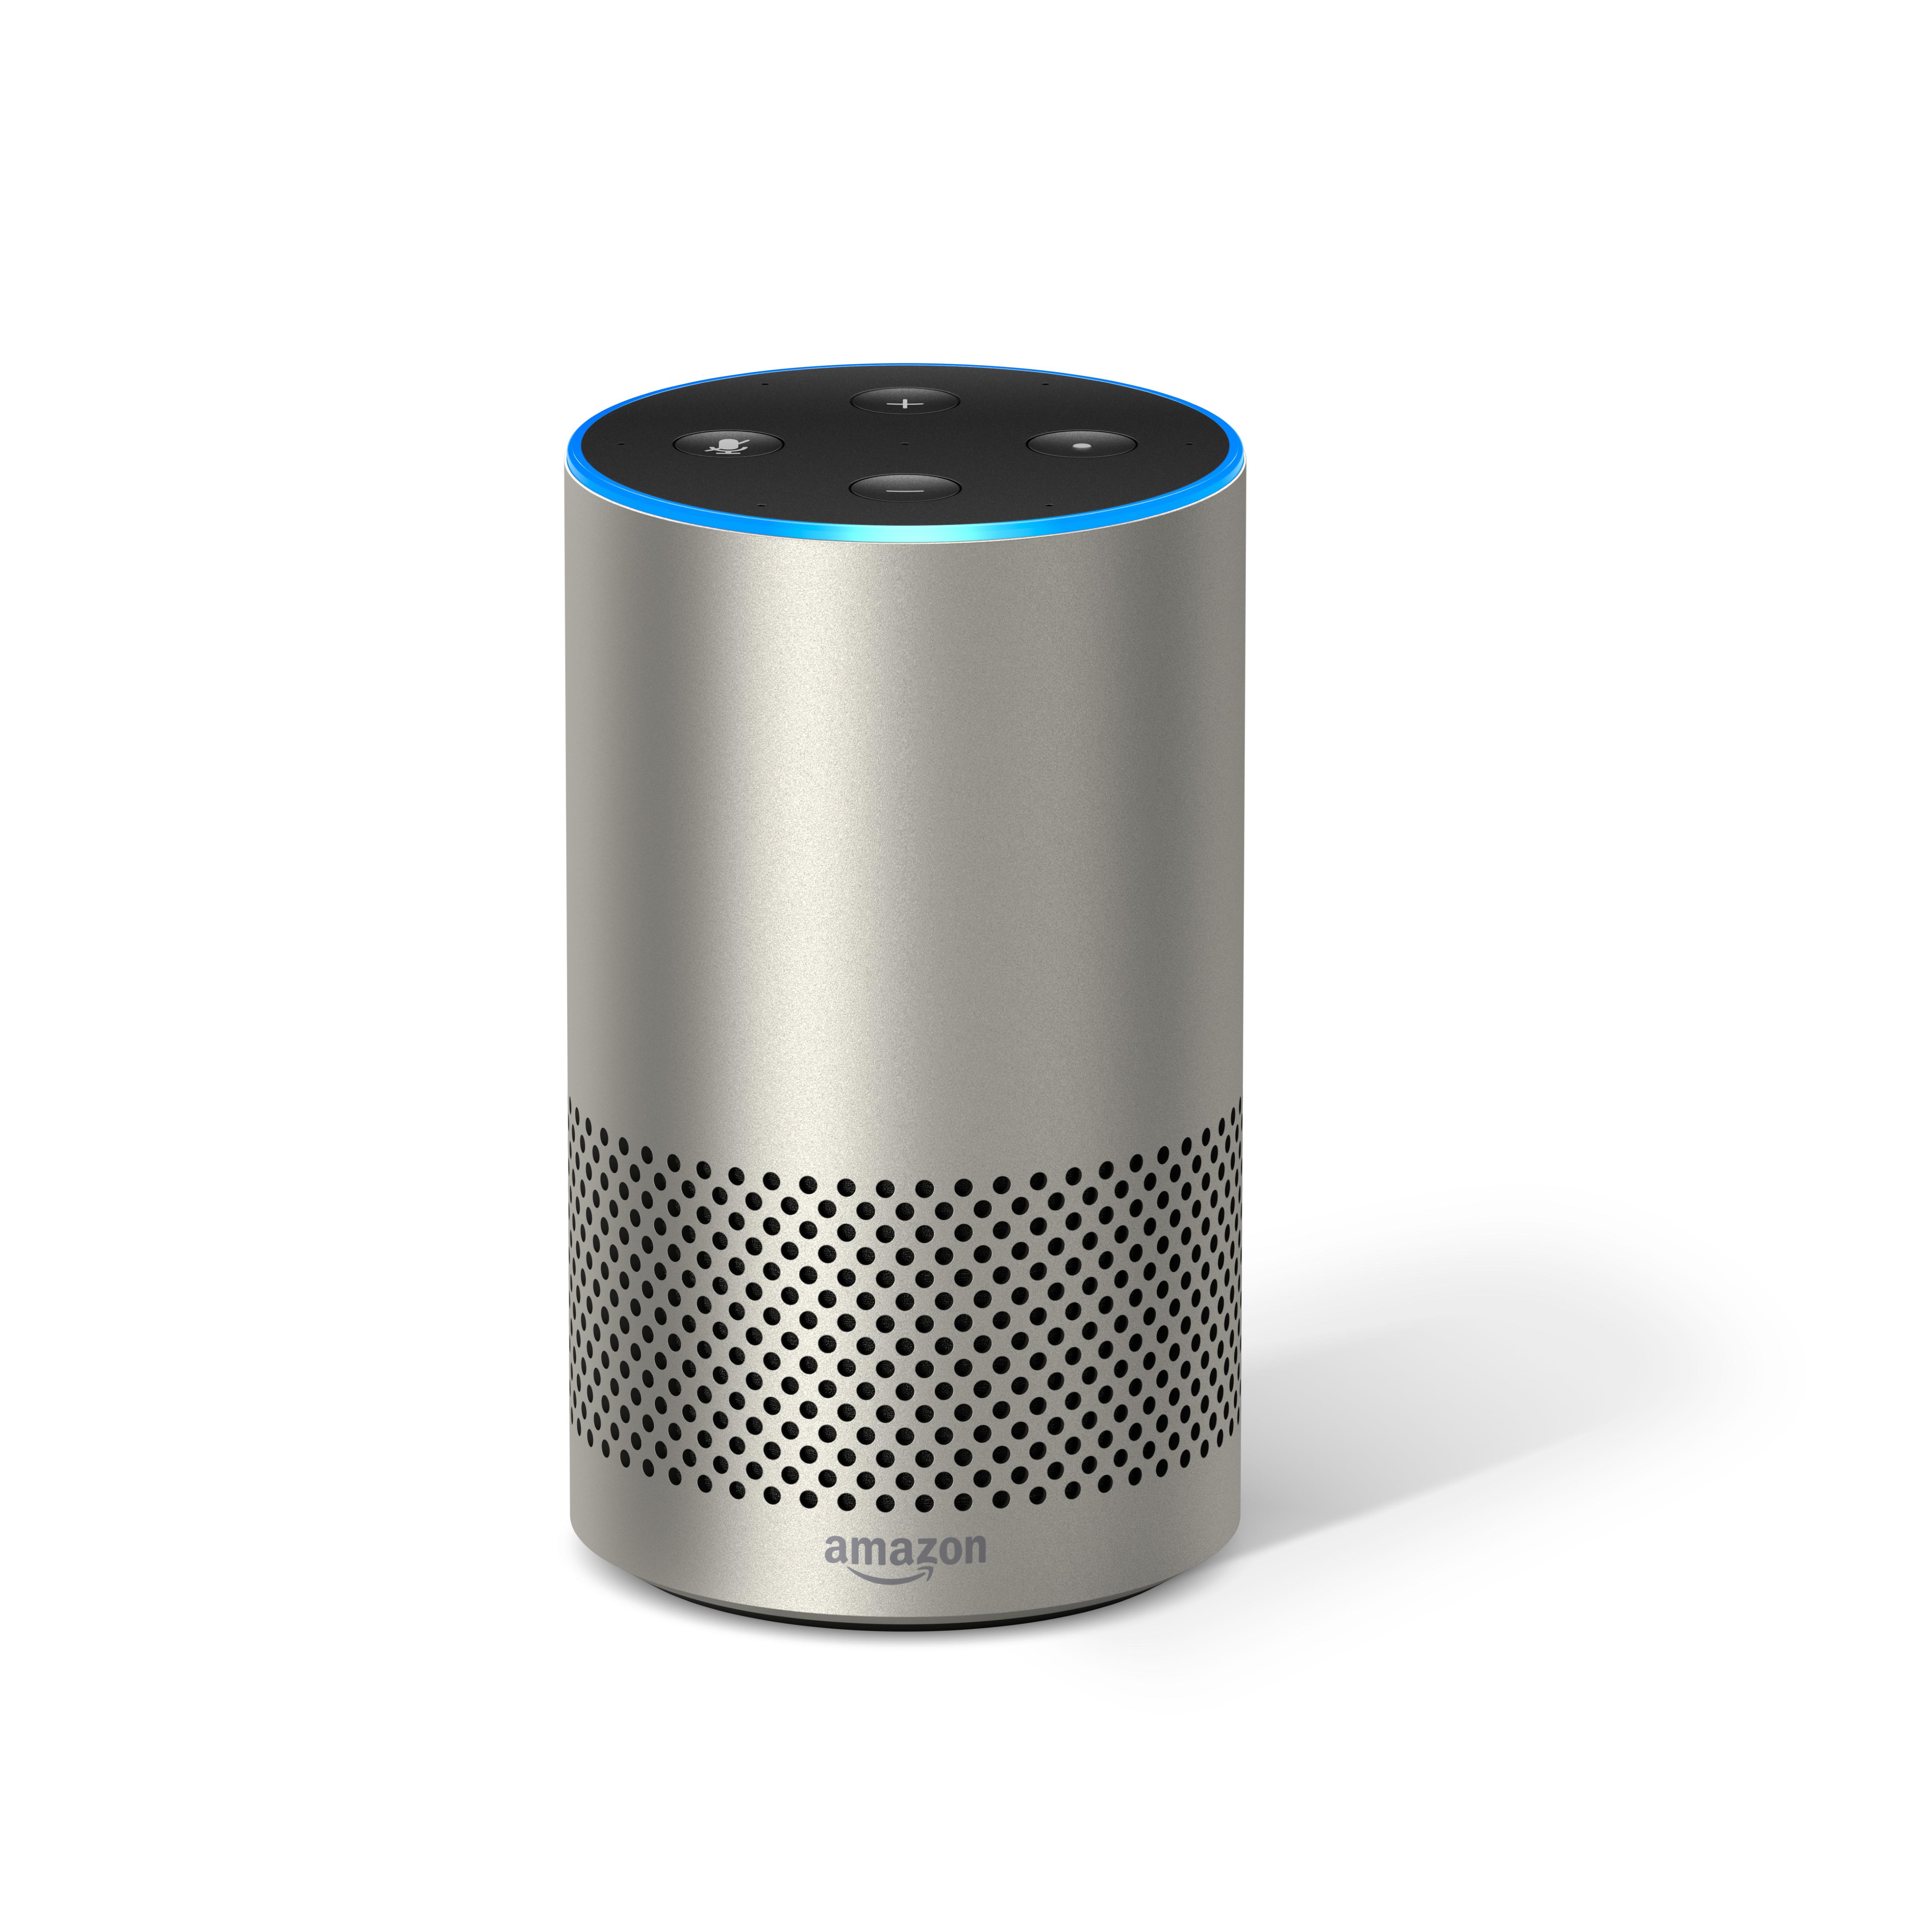 A silver Amazon Echo